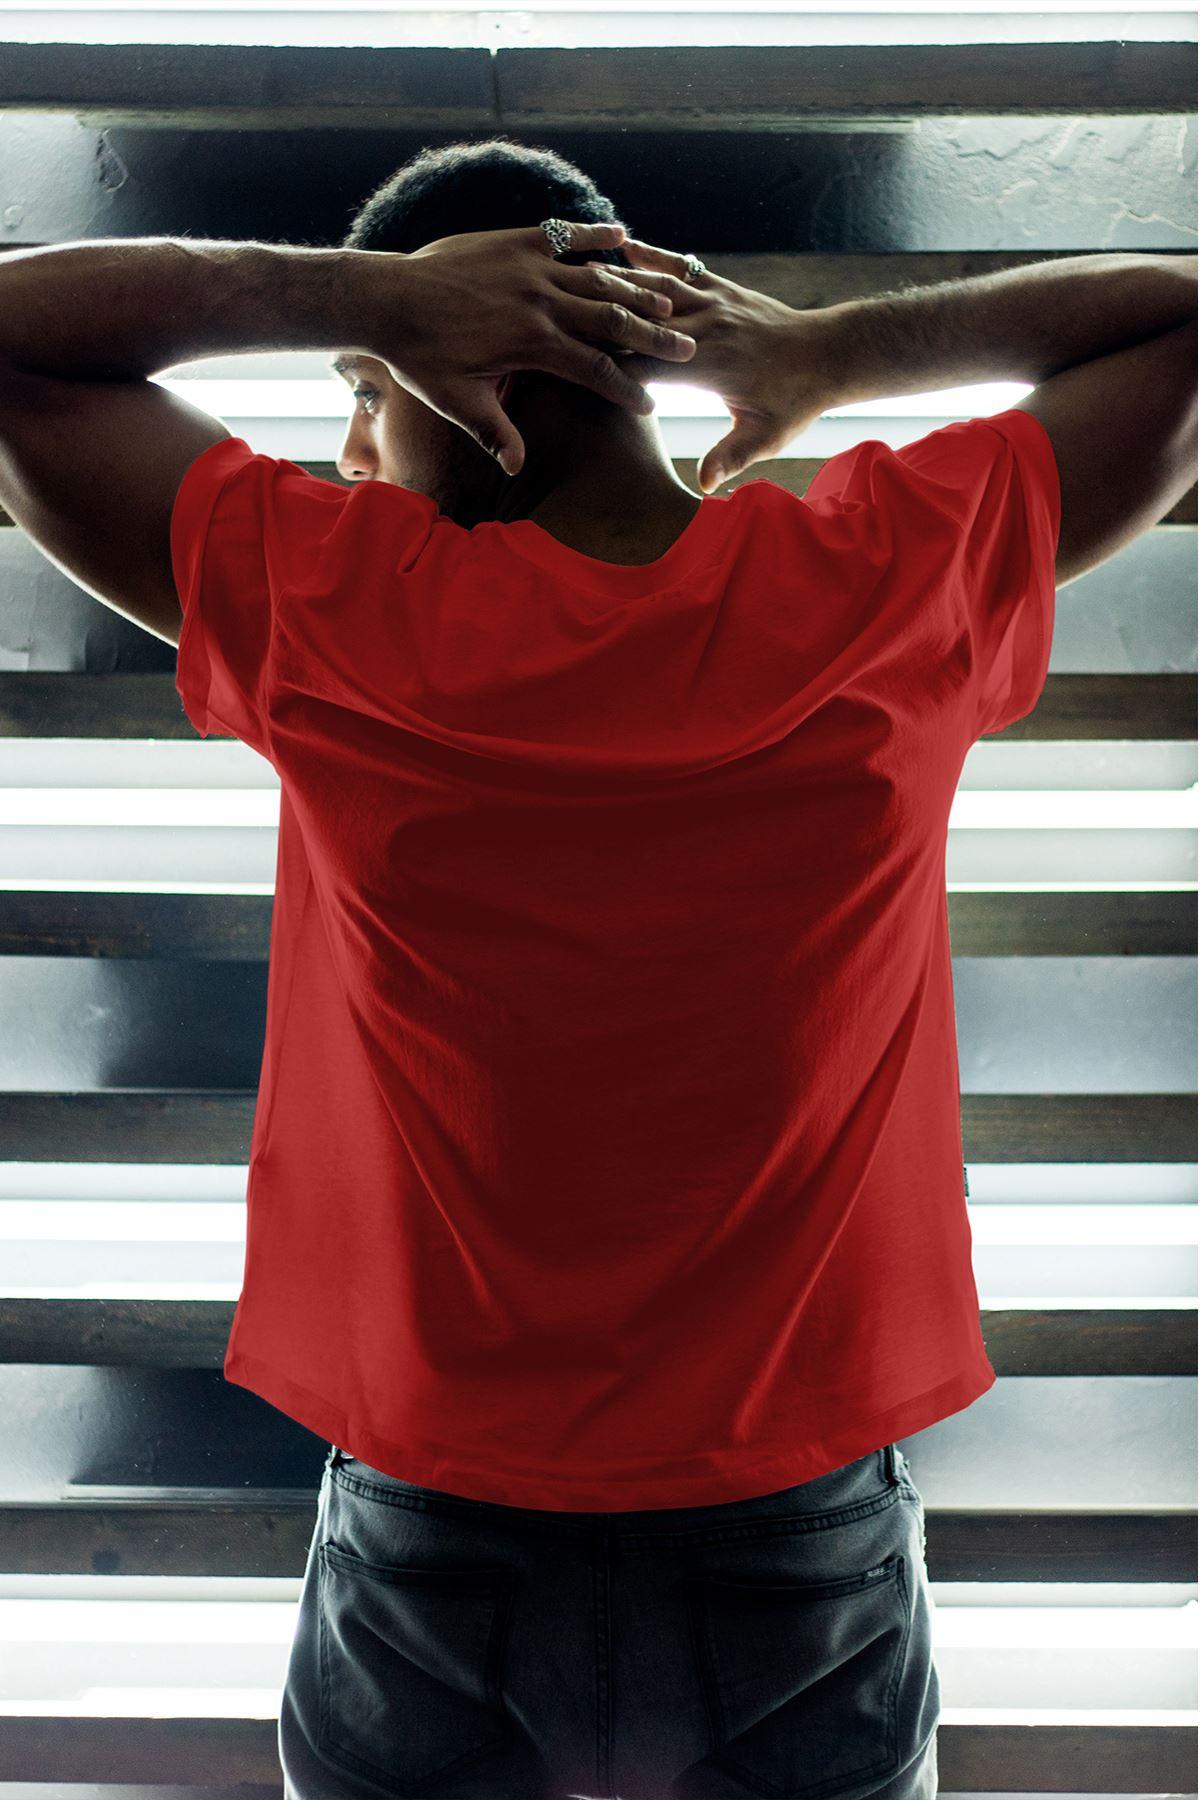 Cleveland 01 Kırmızı Erkek Oversize Tshirt - Tişört